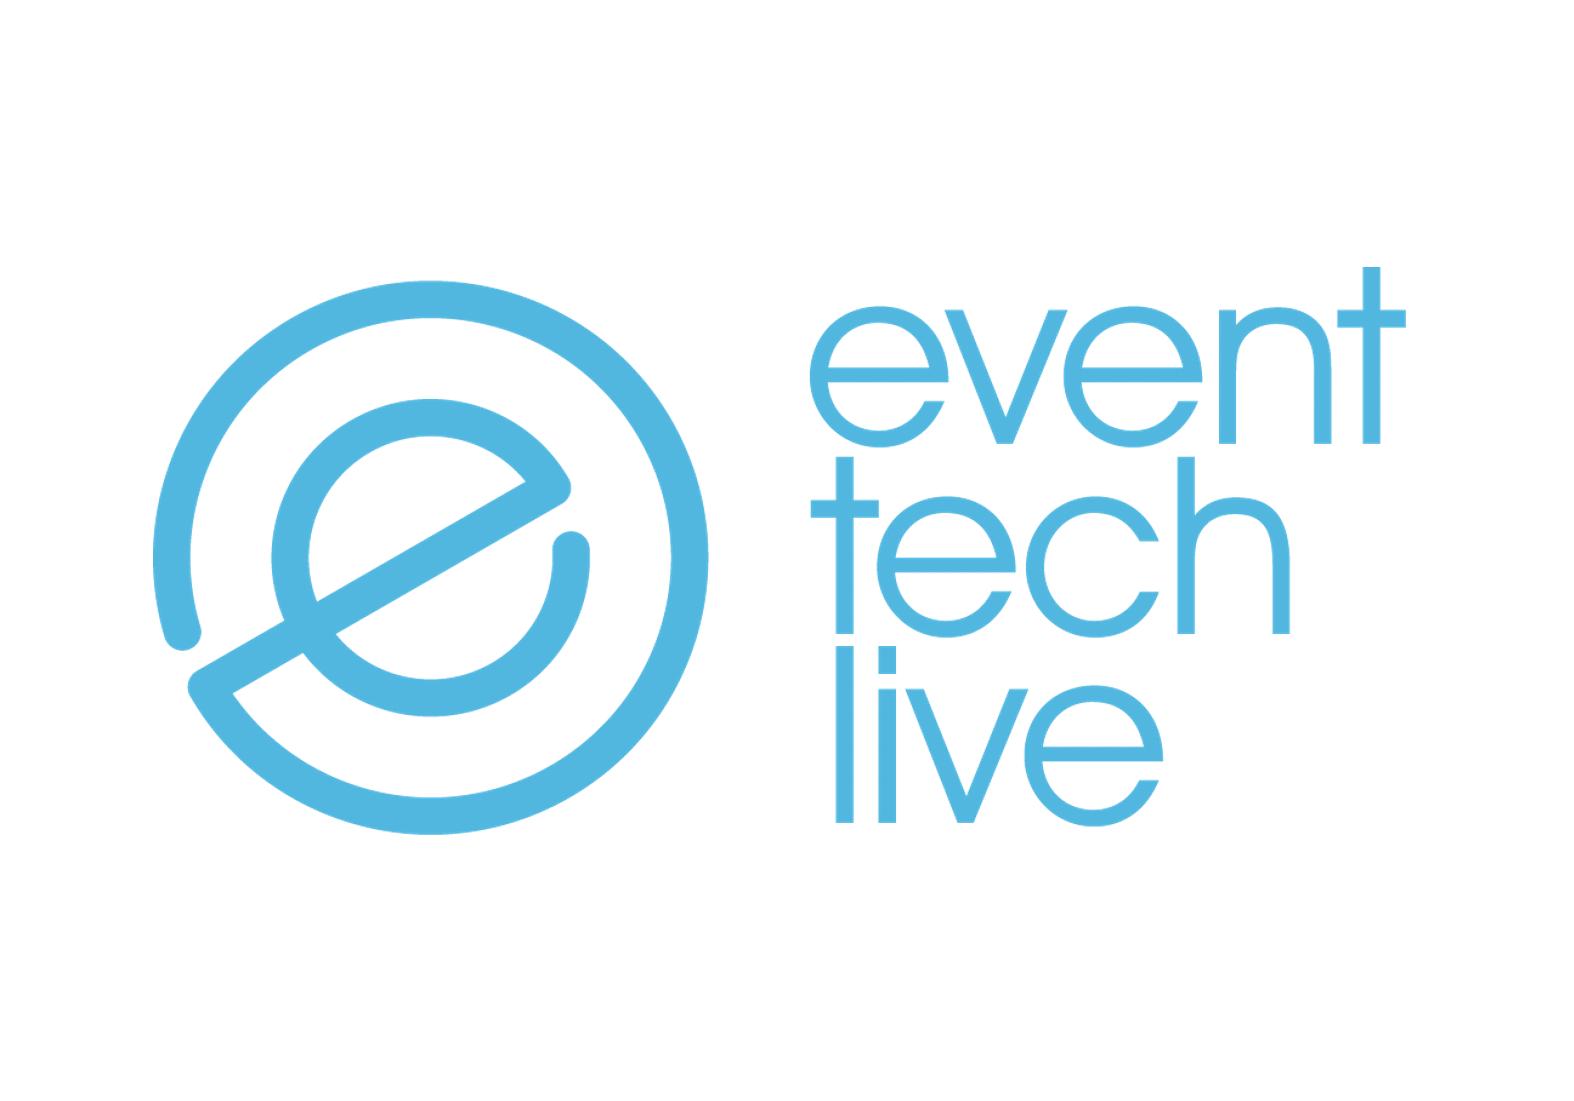 open audience event tech live 2020 virtual exhibitors